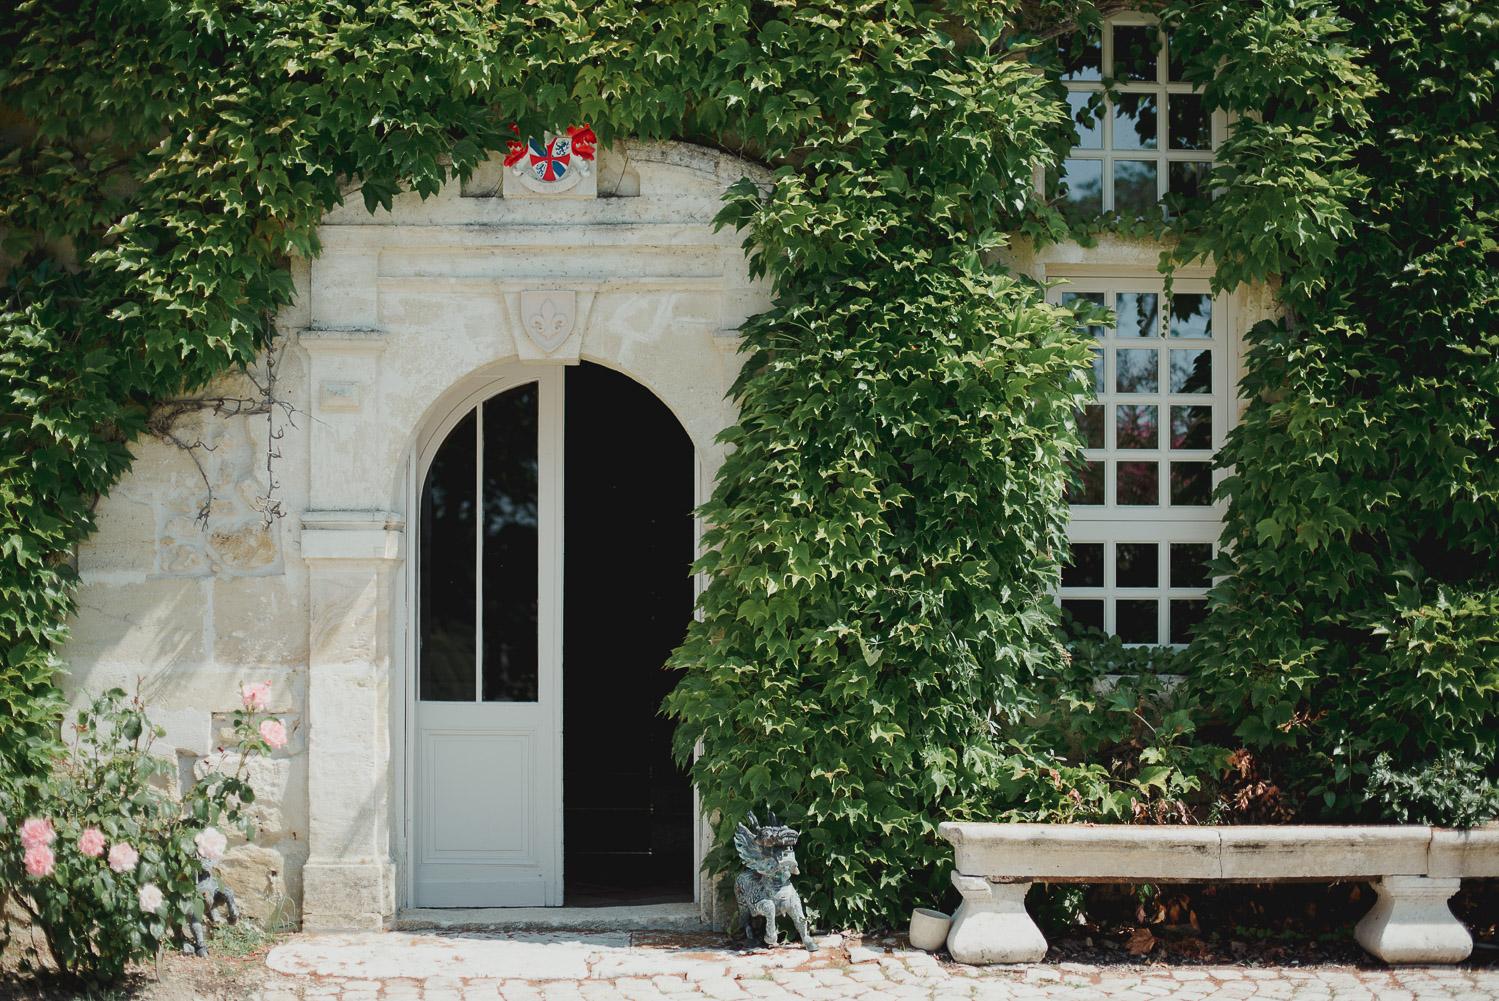 gascony_bordeaux_south_west_france_wedding_tarn_katy_webb_photography_UK9